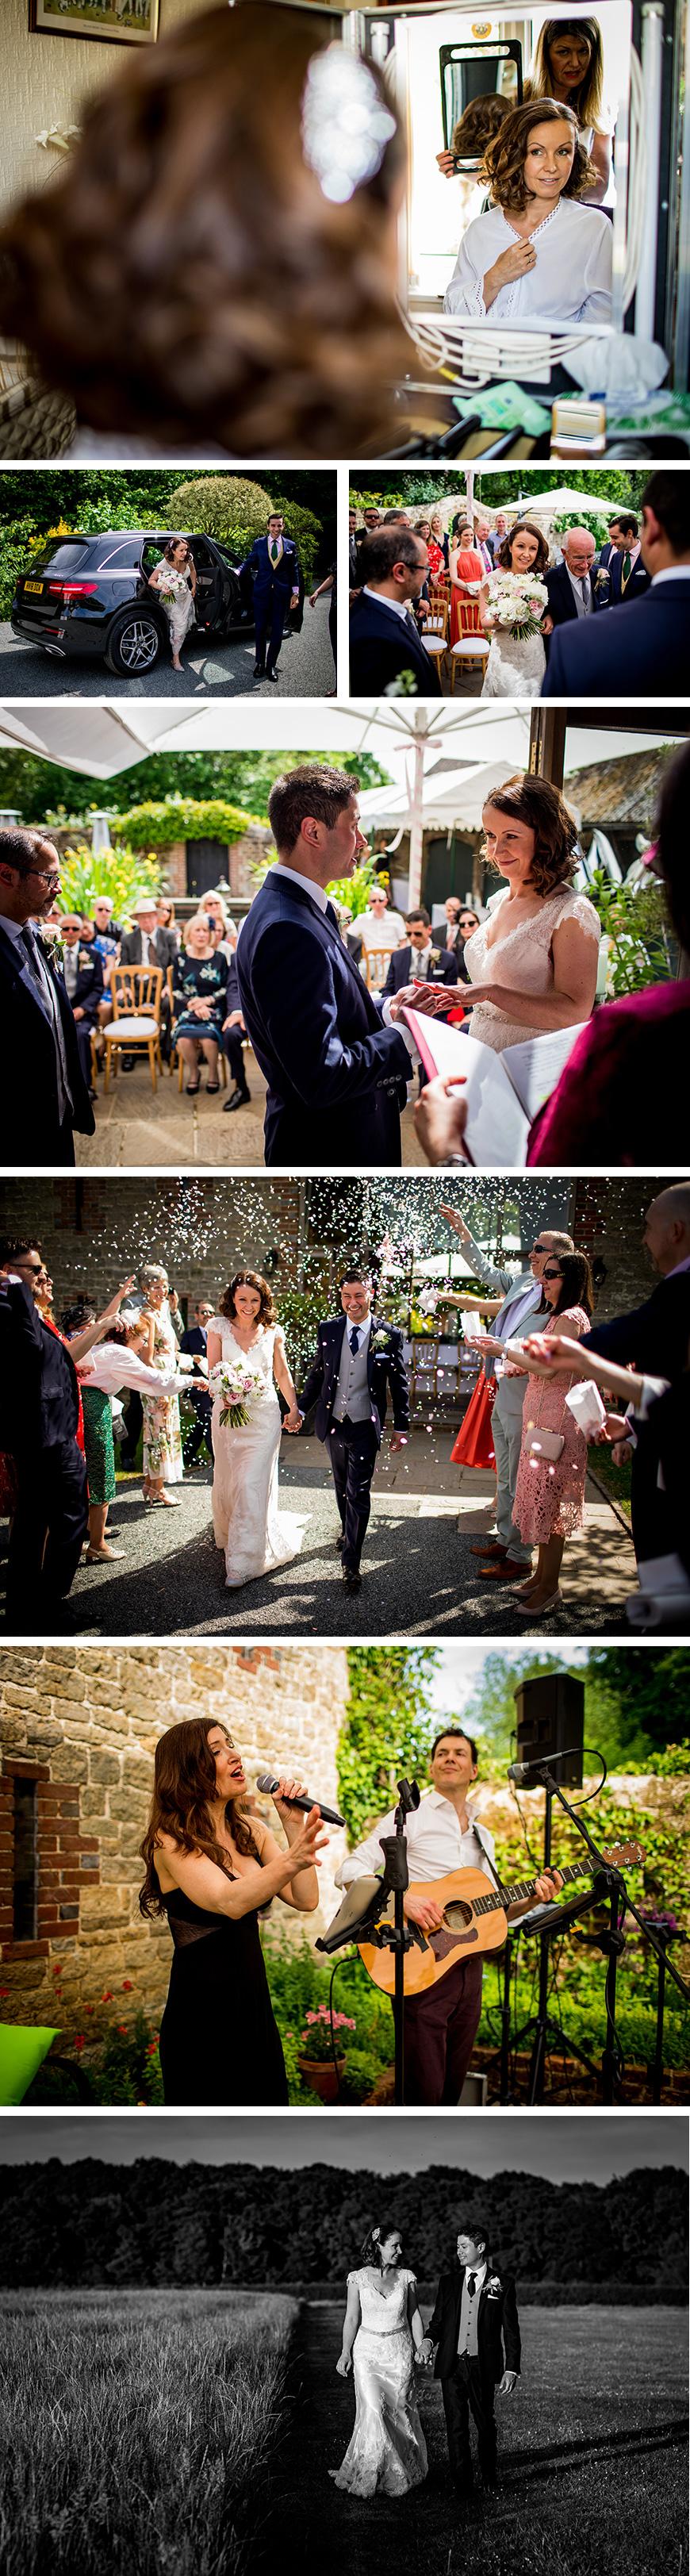 Real Wedding - Nicky and Alex's Intimate Summer Wedding At Bartholomew Barn | CHWV